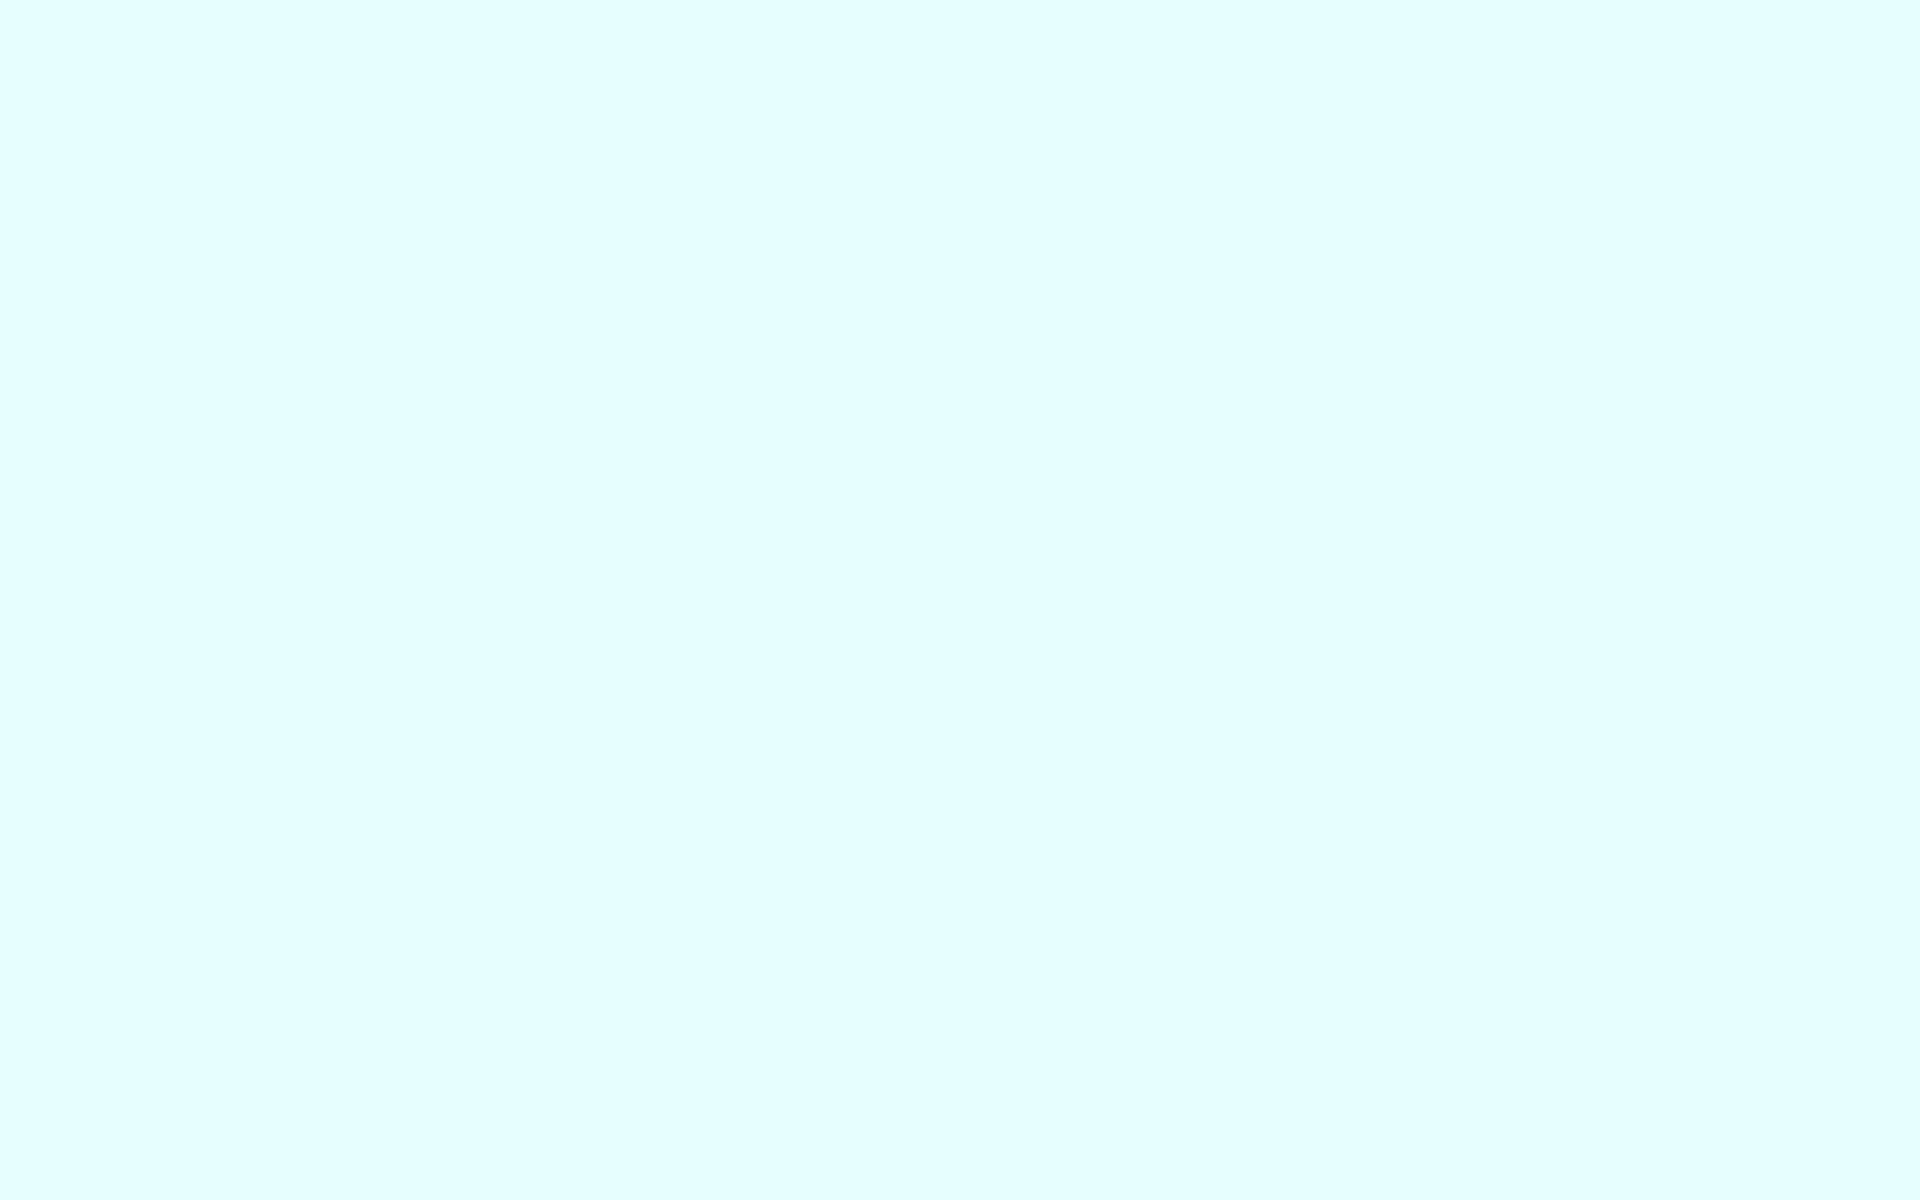 1920x1200 Bubbles Solid Color Background